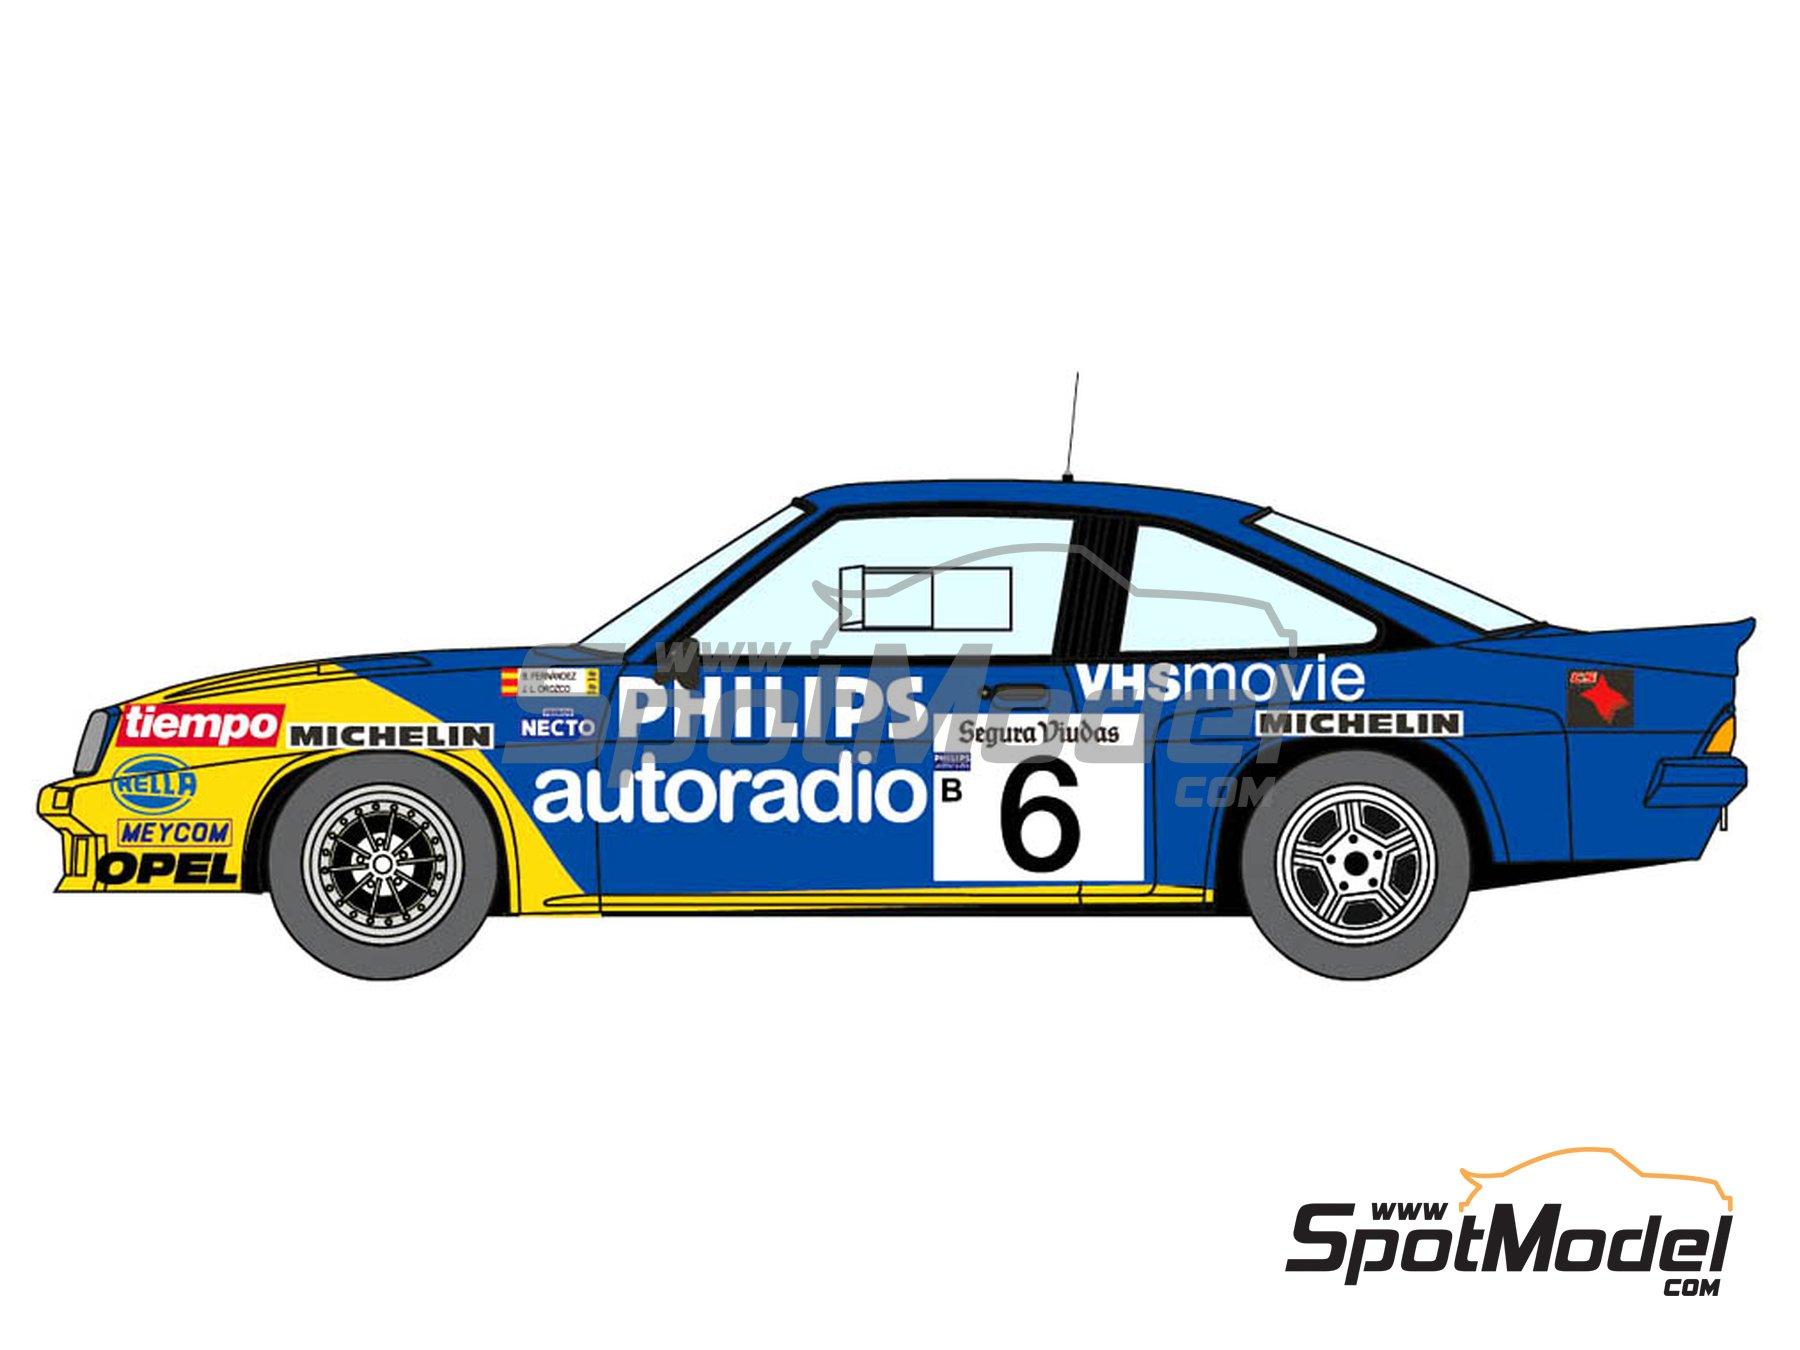 Image 2: Opel Manta 400 Group B Opel Team España - AvD/STH Hunsrück Rallye, Valeo Rally, Rallye Catalunya, Rally Albena - Zlatni Piassatzi - Sliven 1986 | Marking / livery in 1/24 scale manufactured by Decalcas (ref.DCL-DEC017)